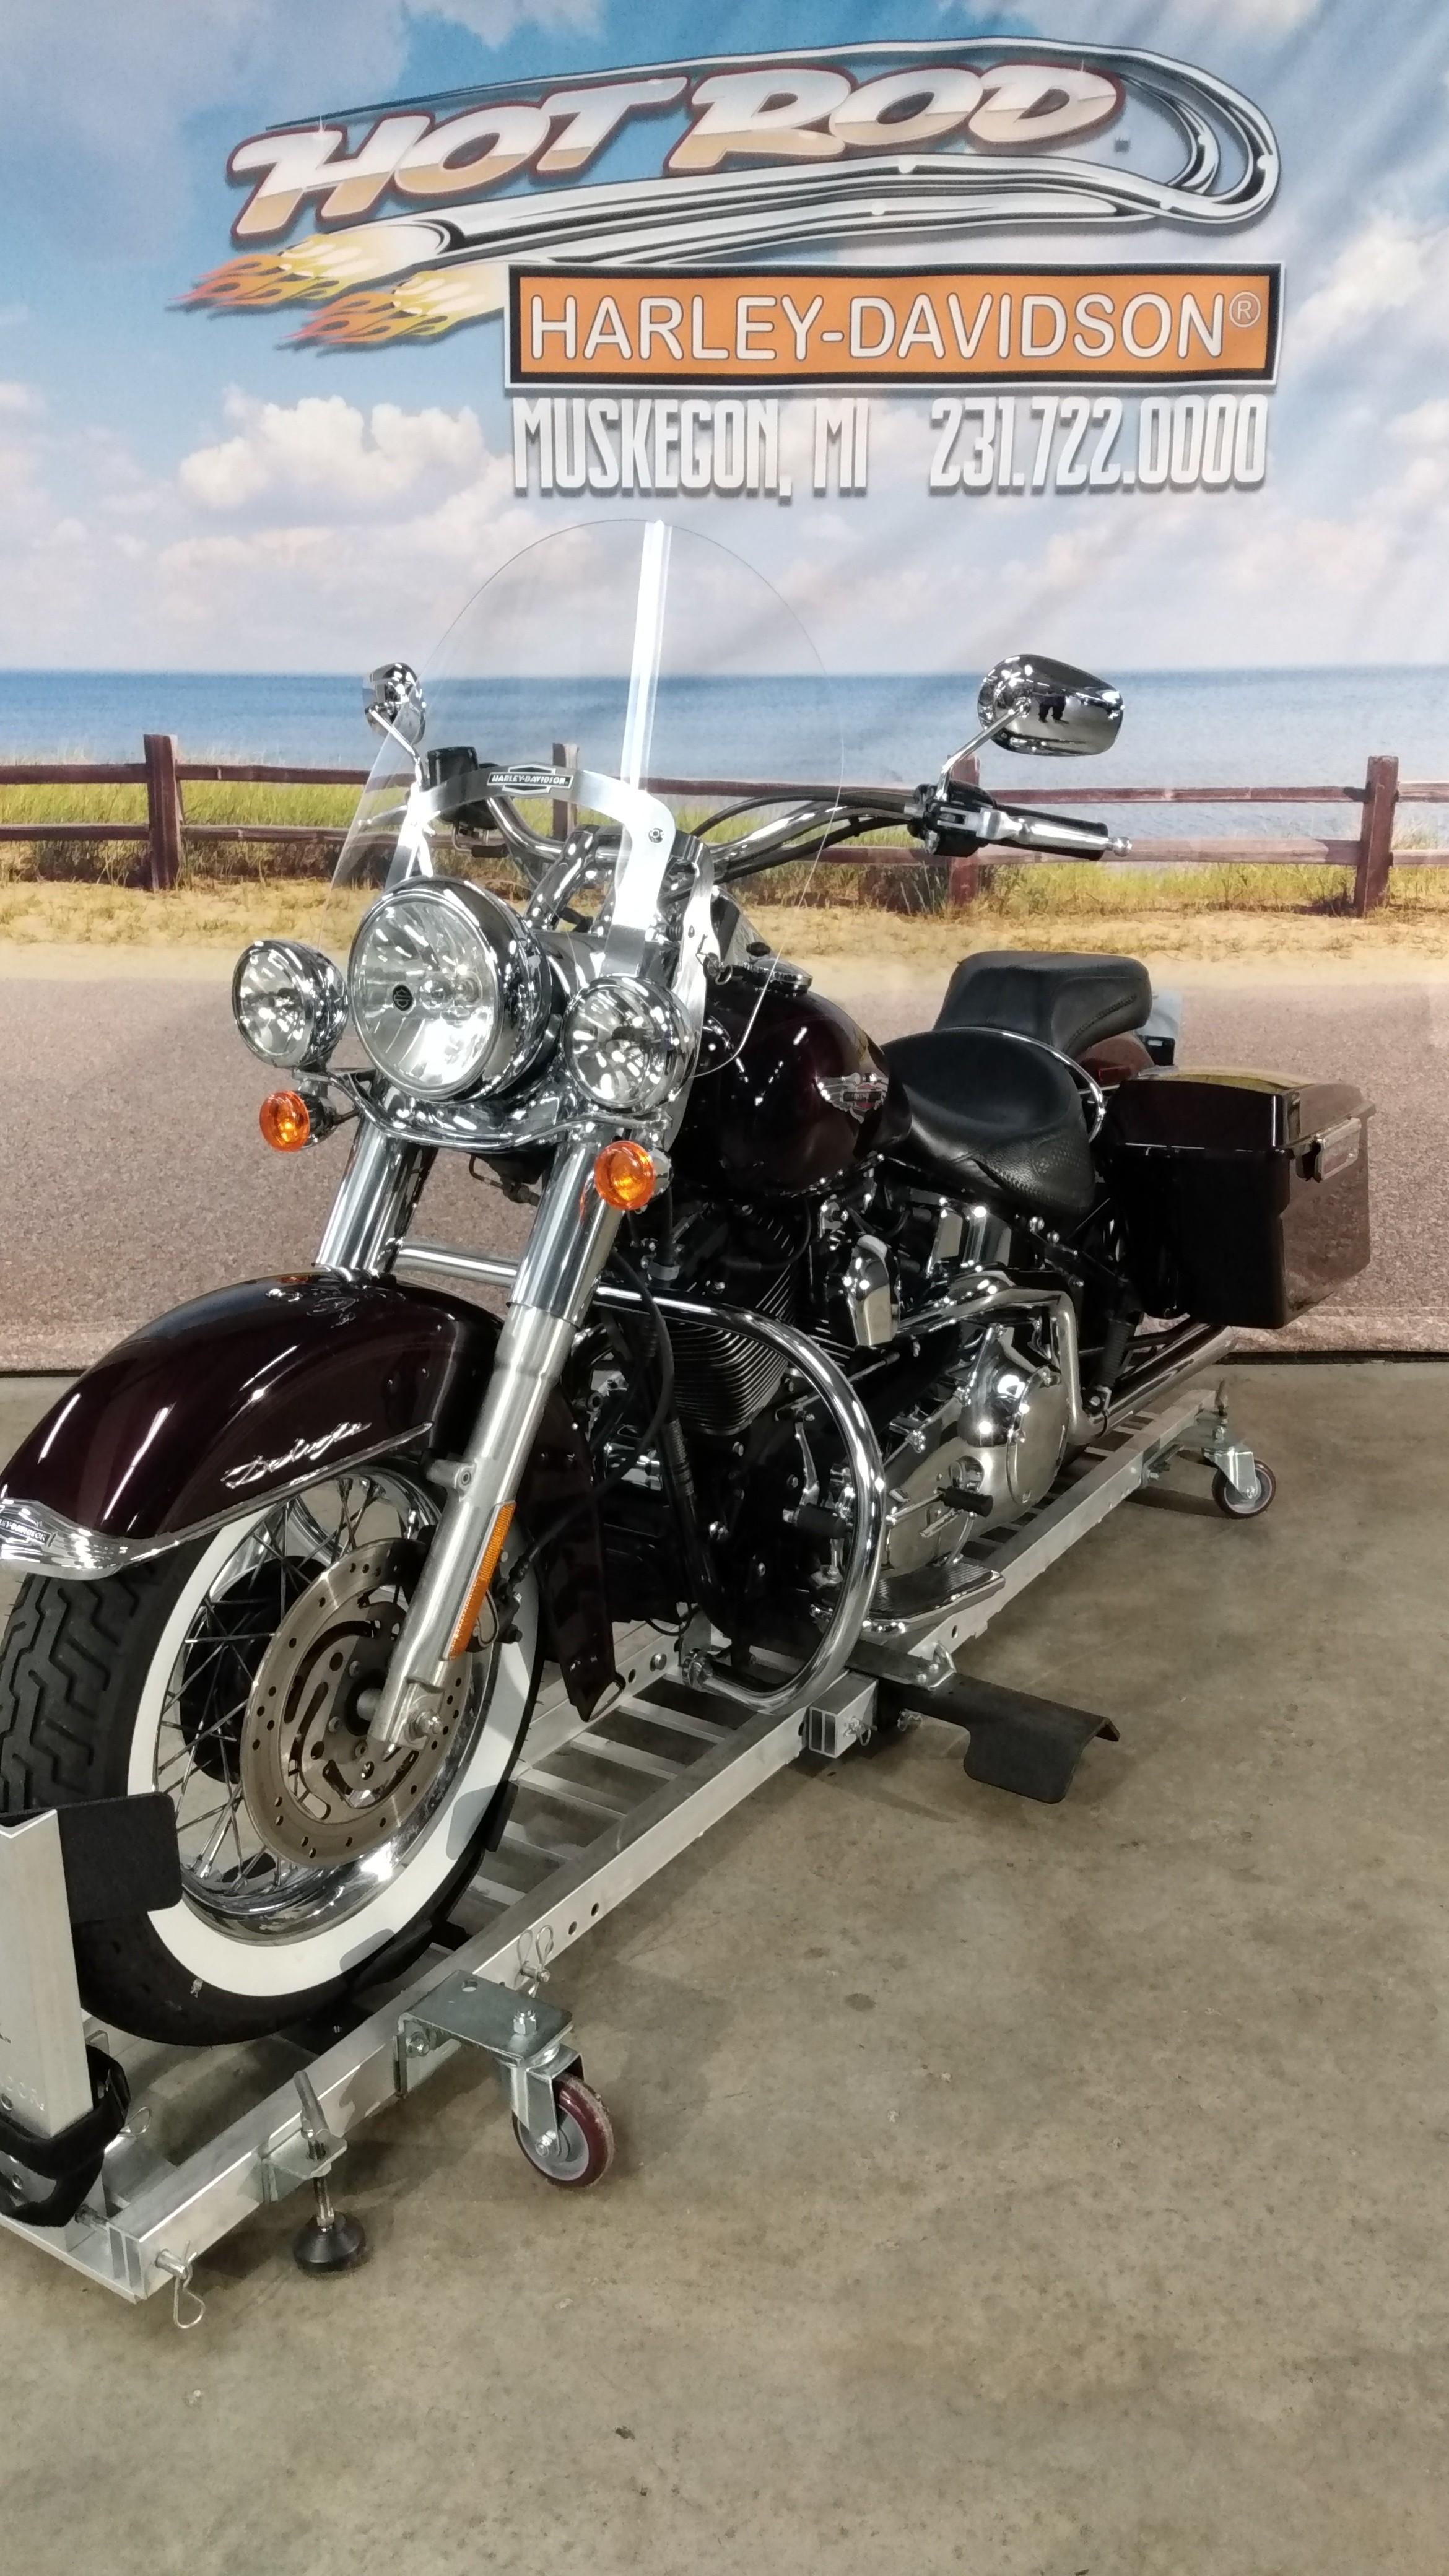 2005 Harley-Davidson Softail Deluxe at Hot Rod Harley-Davidson